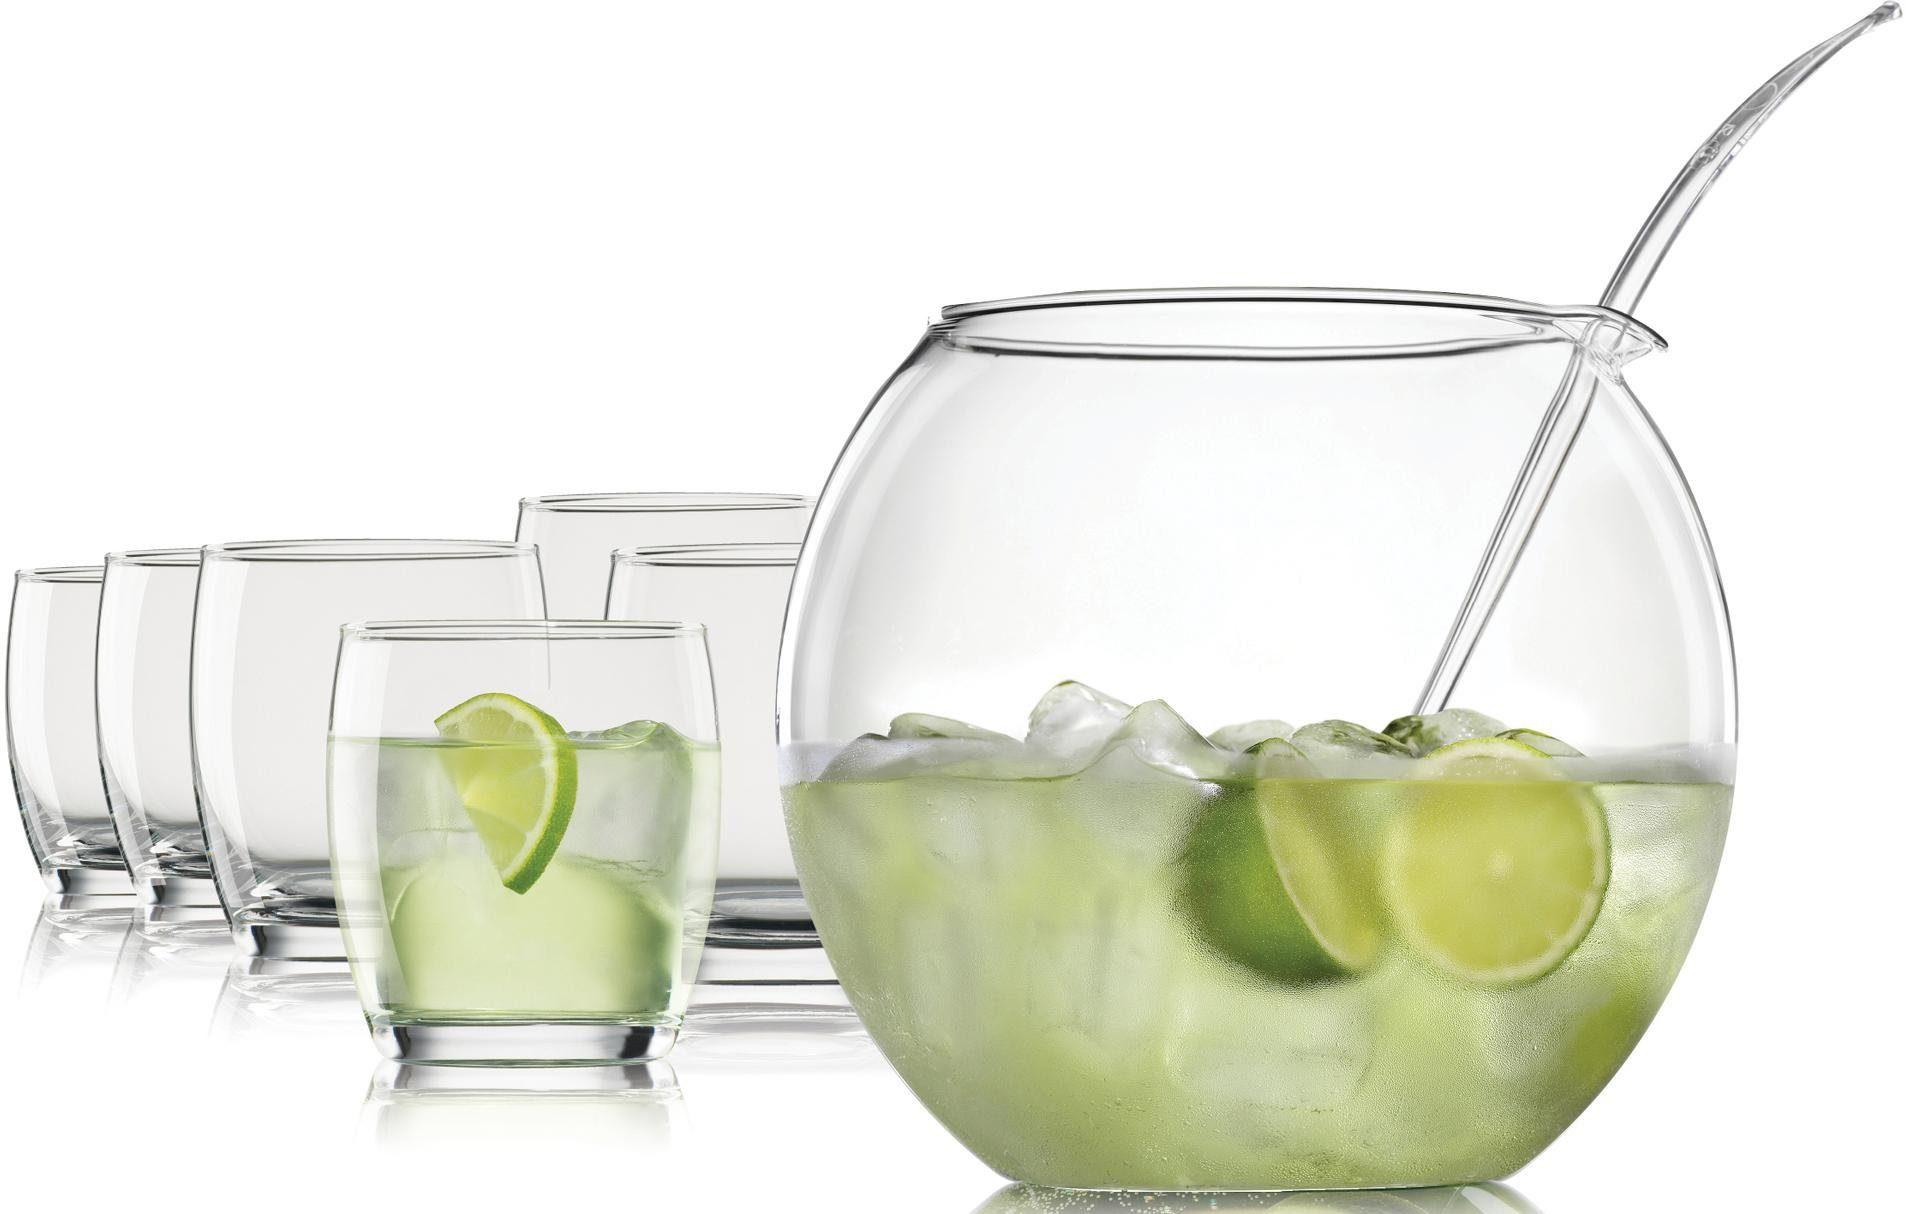 Bohemia Selection Bowle-Set, Borosilikatglas (Bowlekörper) und Kristallglas (Bowlebecher), 8 Teile